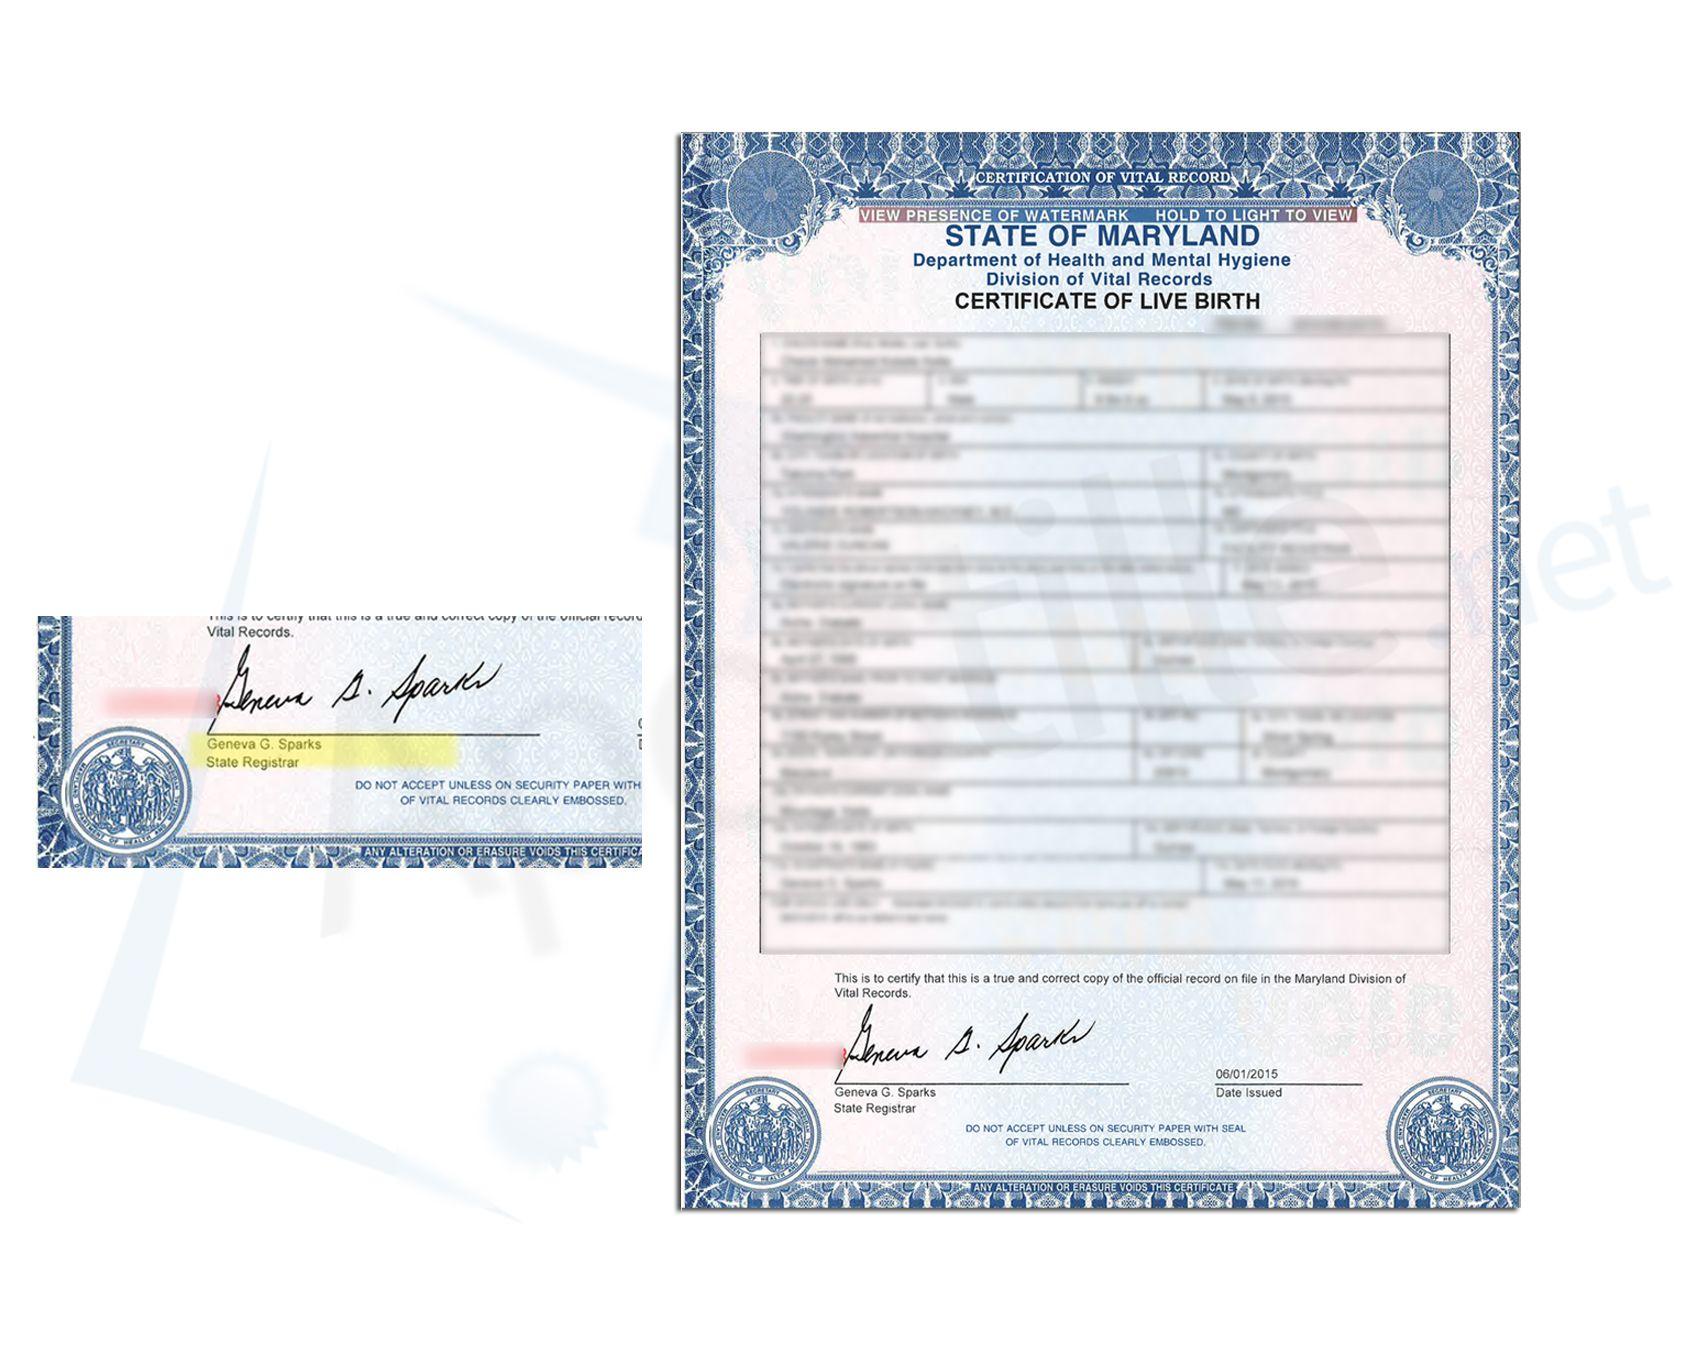 County of montgomery state of maryland birth certificate issued by county of montgomery state of maryland birth certificate issued by geneva s sparls state registrar xflitez Gallery